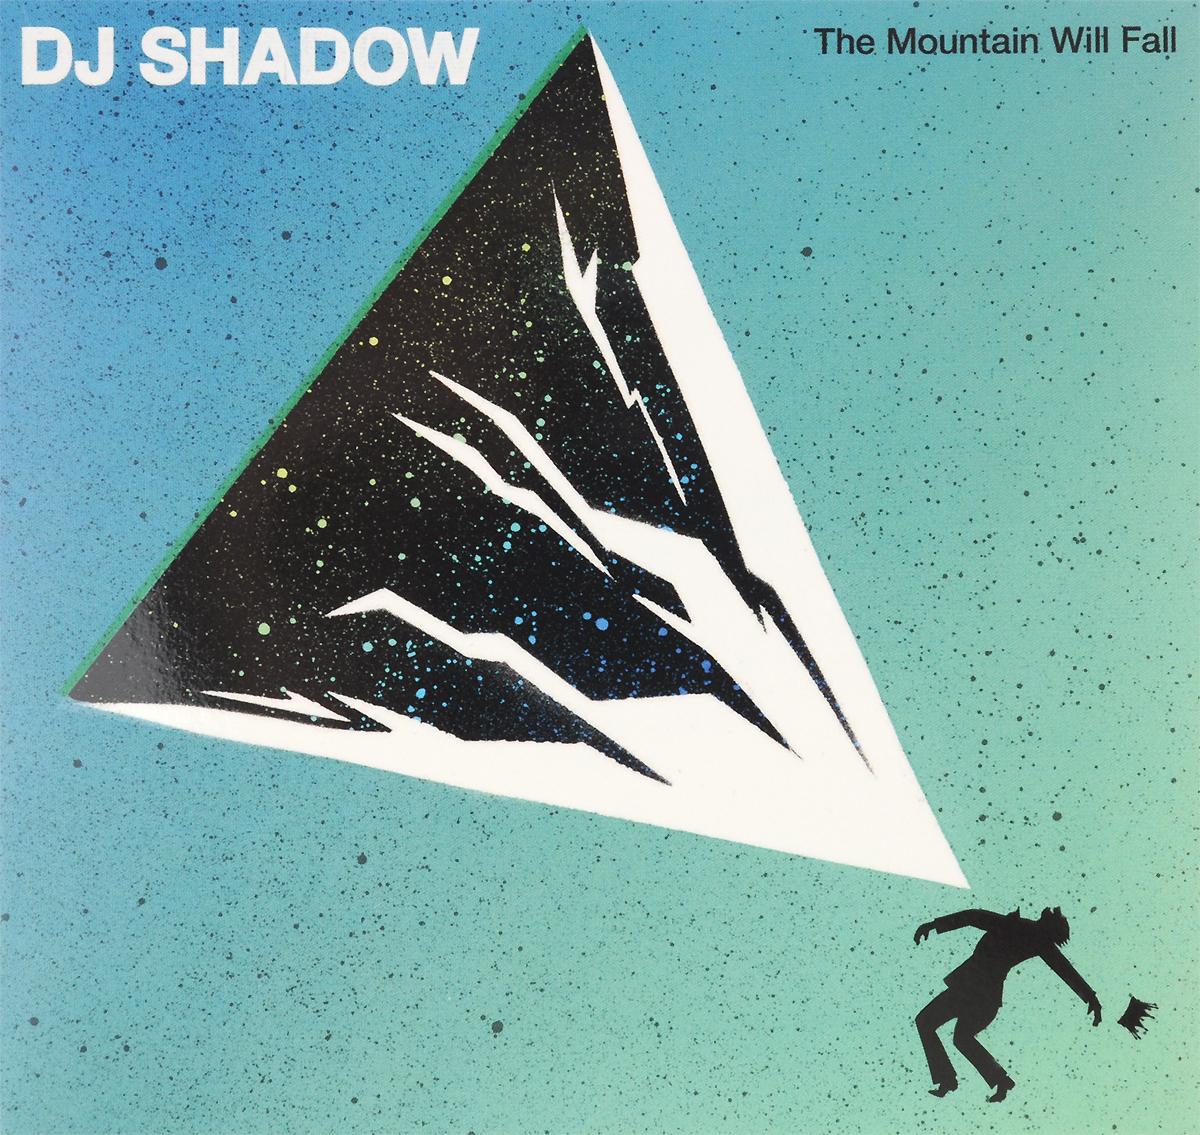 цены на DJ Shadow DJ Shadow. The Mountain Will Fall  в интернет-магазинах